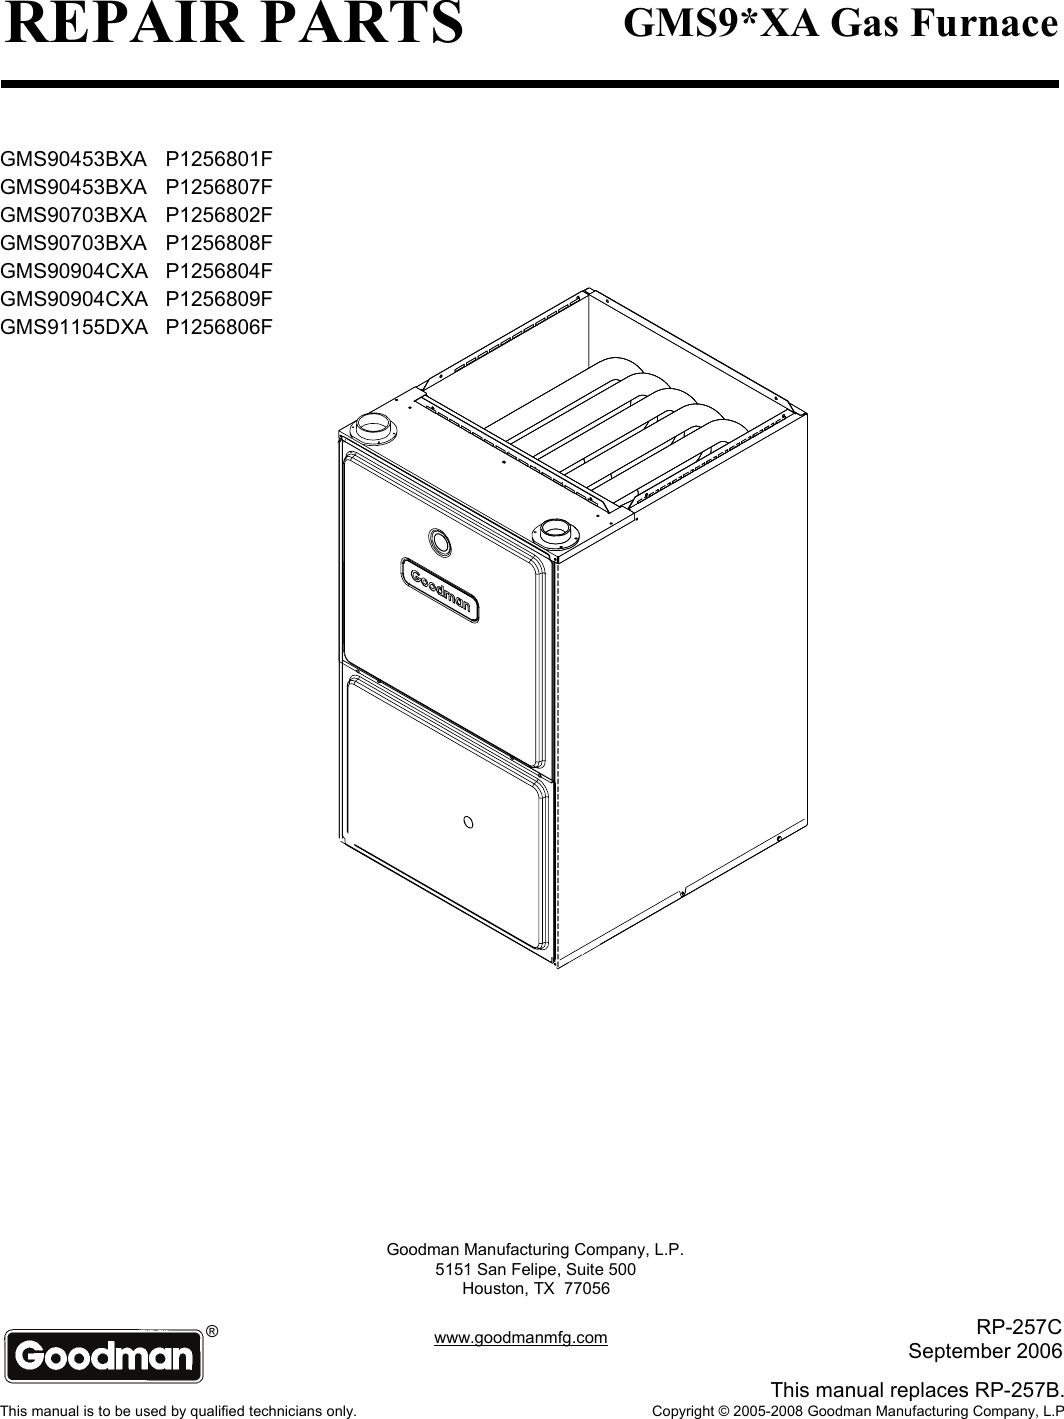 GoodmanMfgP1256801FUsersManual429694.1212782853 User Guide Page 1 goodman mfg p1256801f users manual